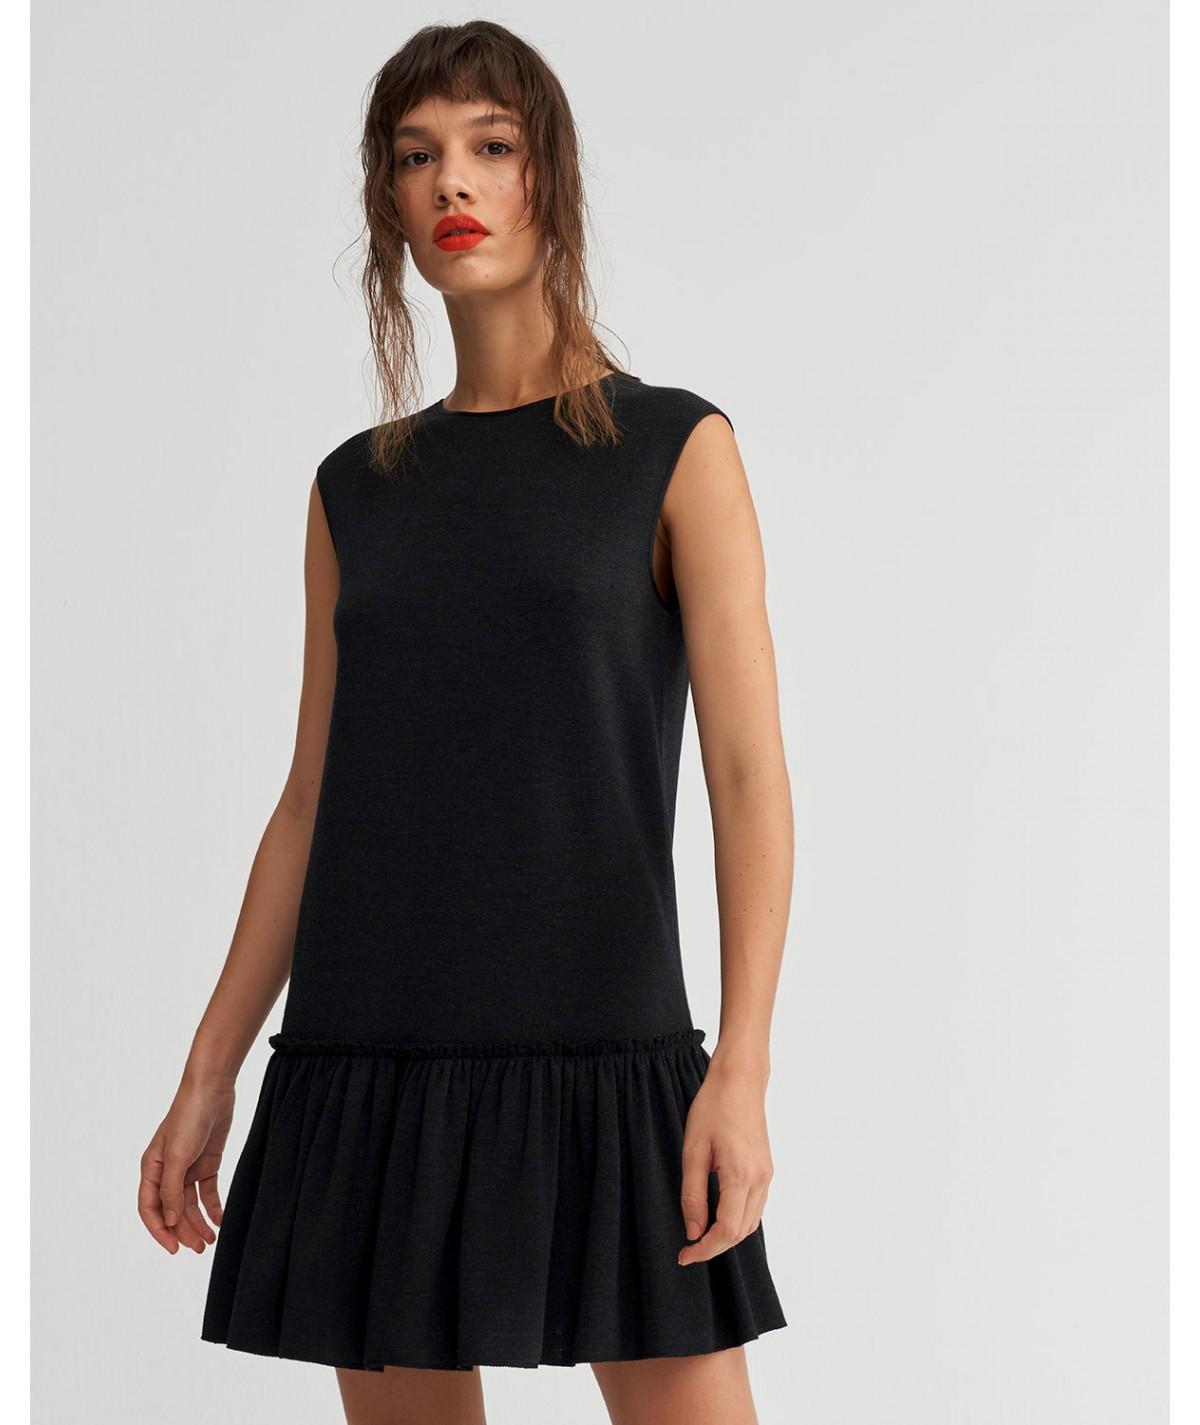 Frelsi Örme  Elbise